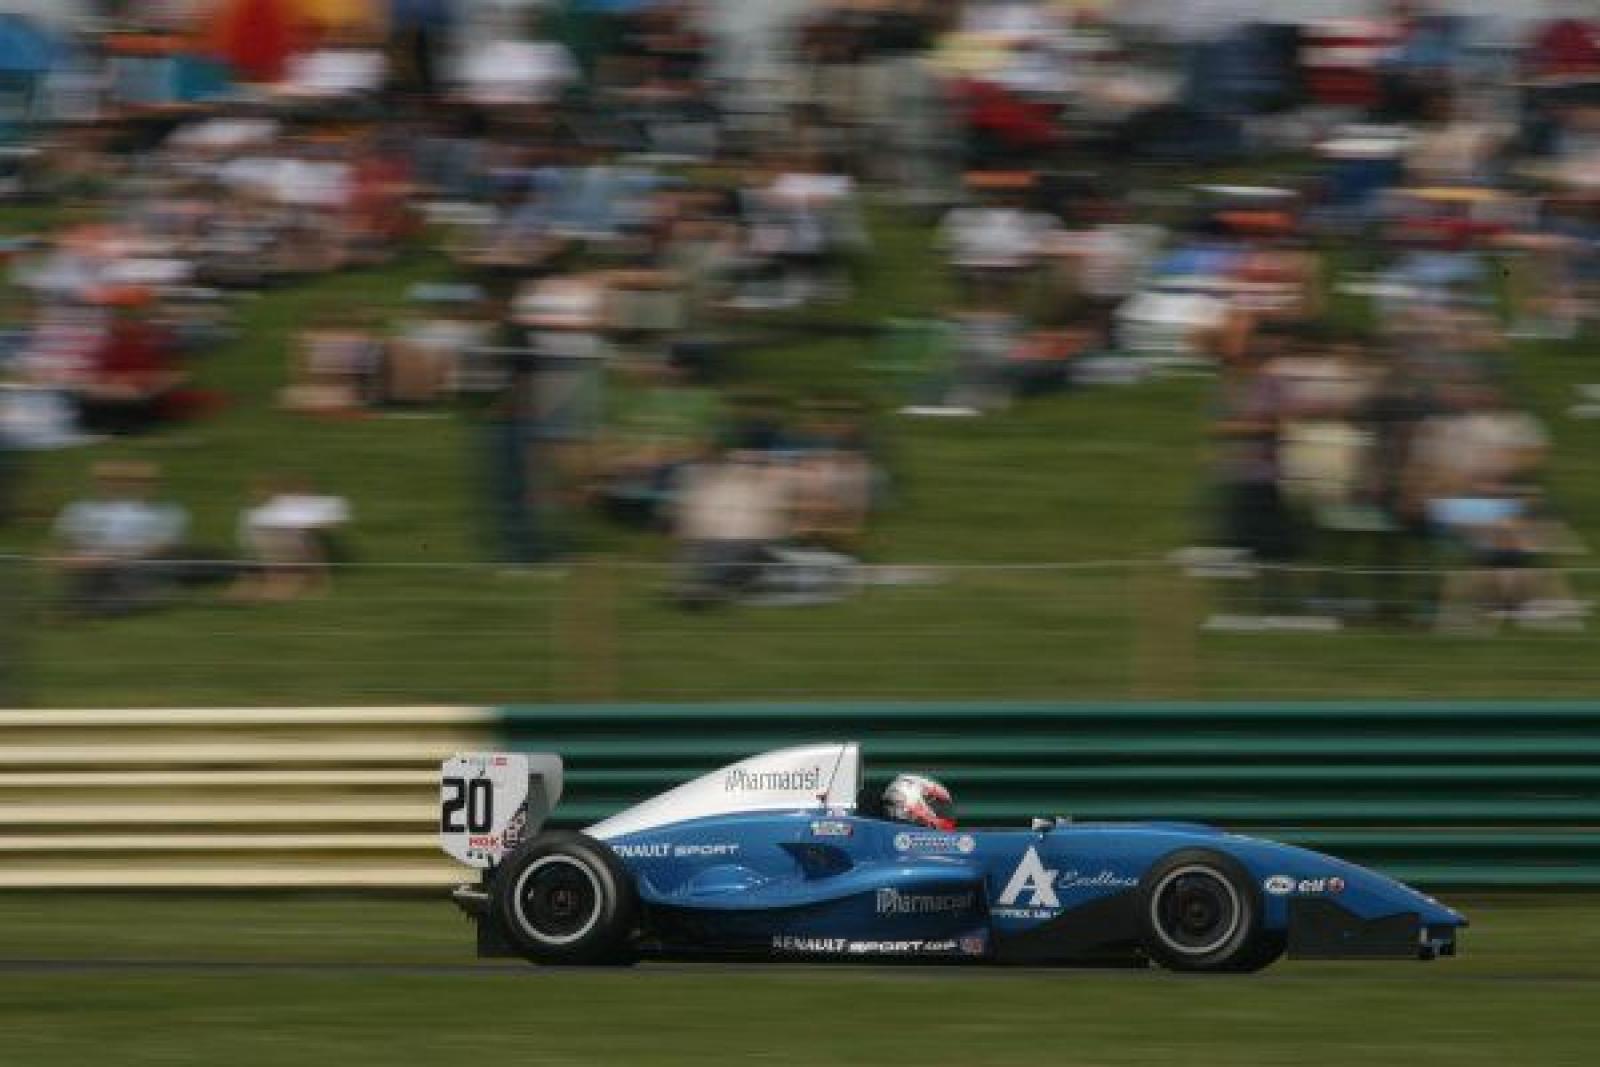 Formula Renault 2.0 2008 Eurocup - 6